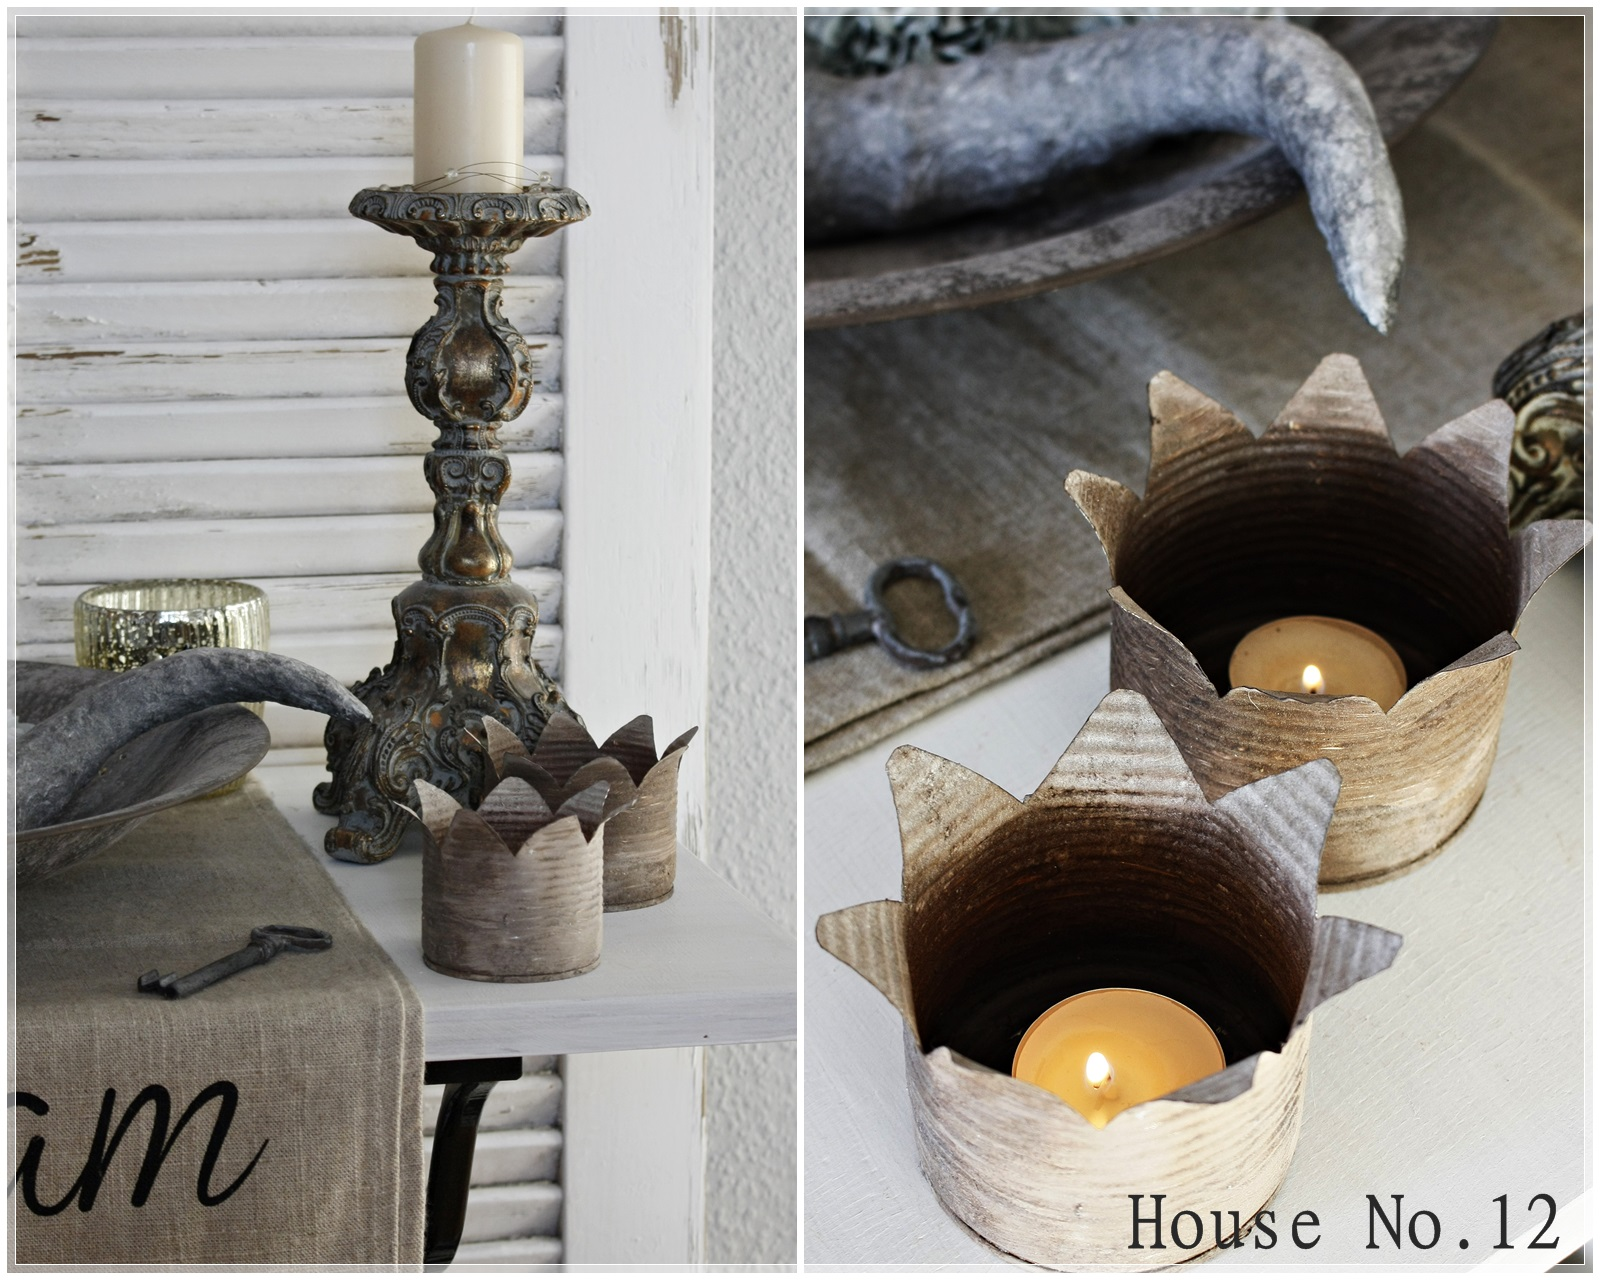 House diy kronenlichter aus konservendosen for Blechdosen basteln